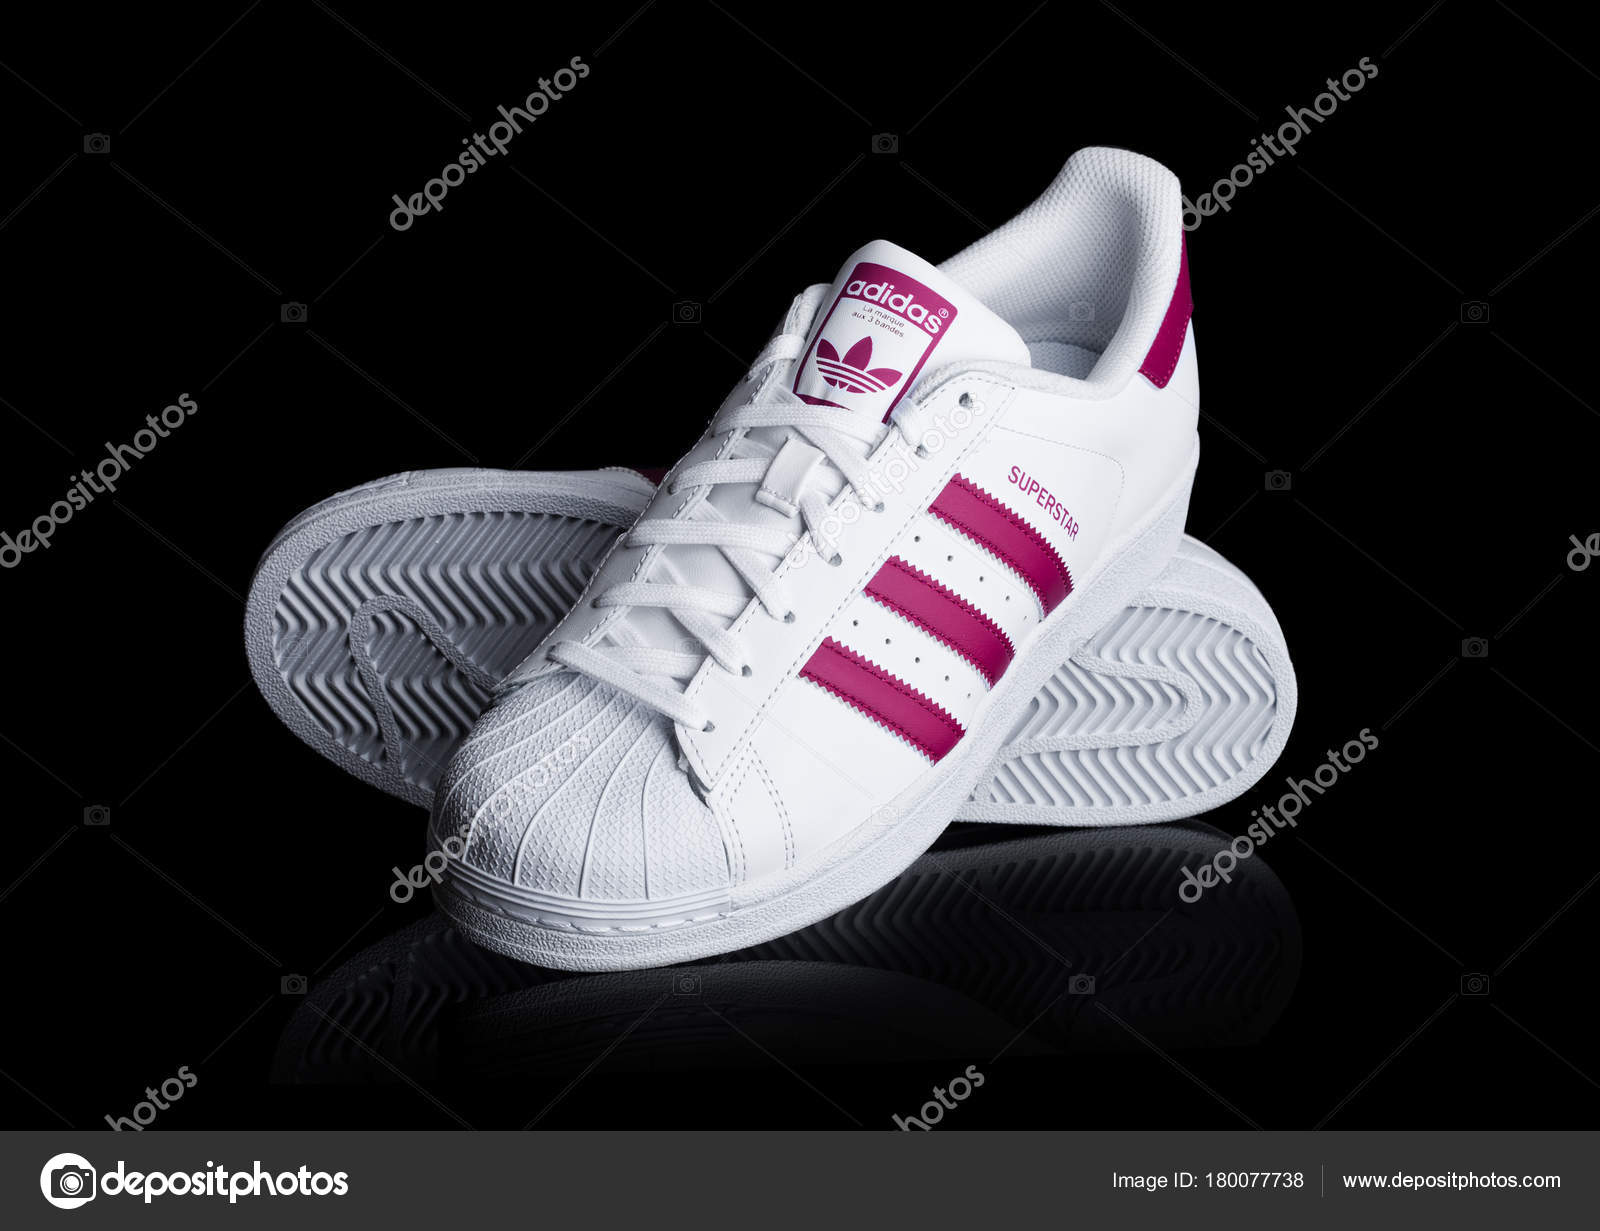 Adidas Online Sports Shop Adidas Black UK Adidas